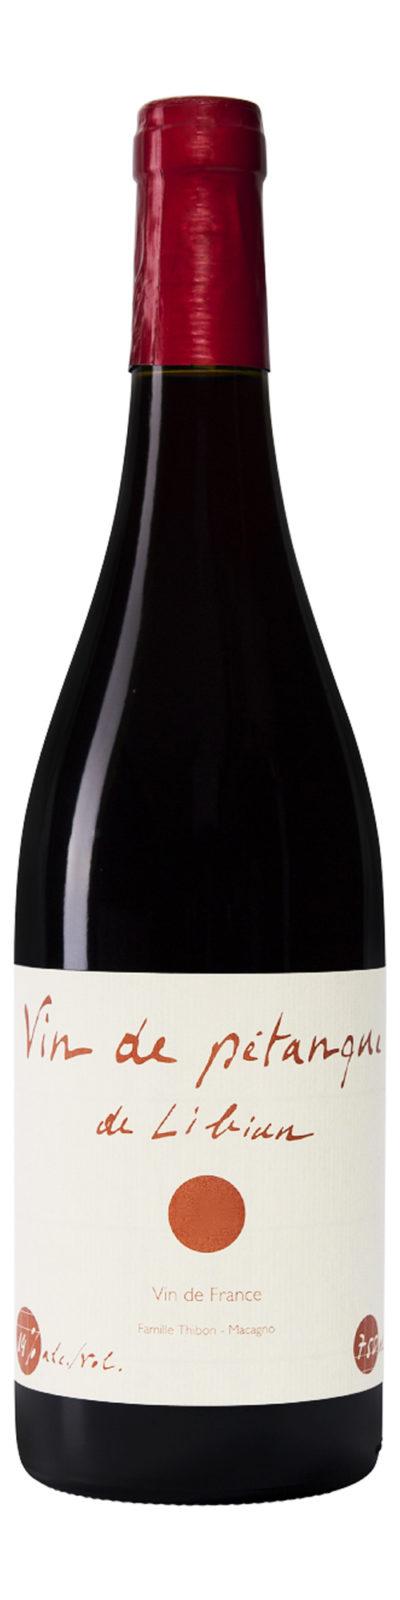 Mas de Libian Vin de Petanque